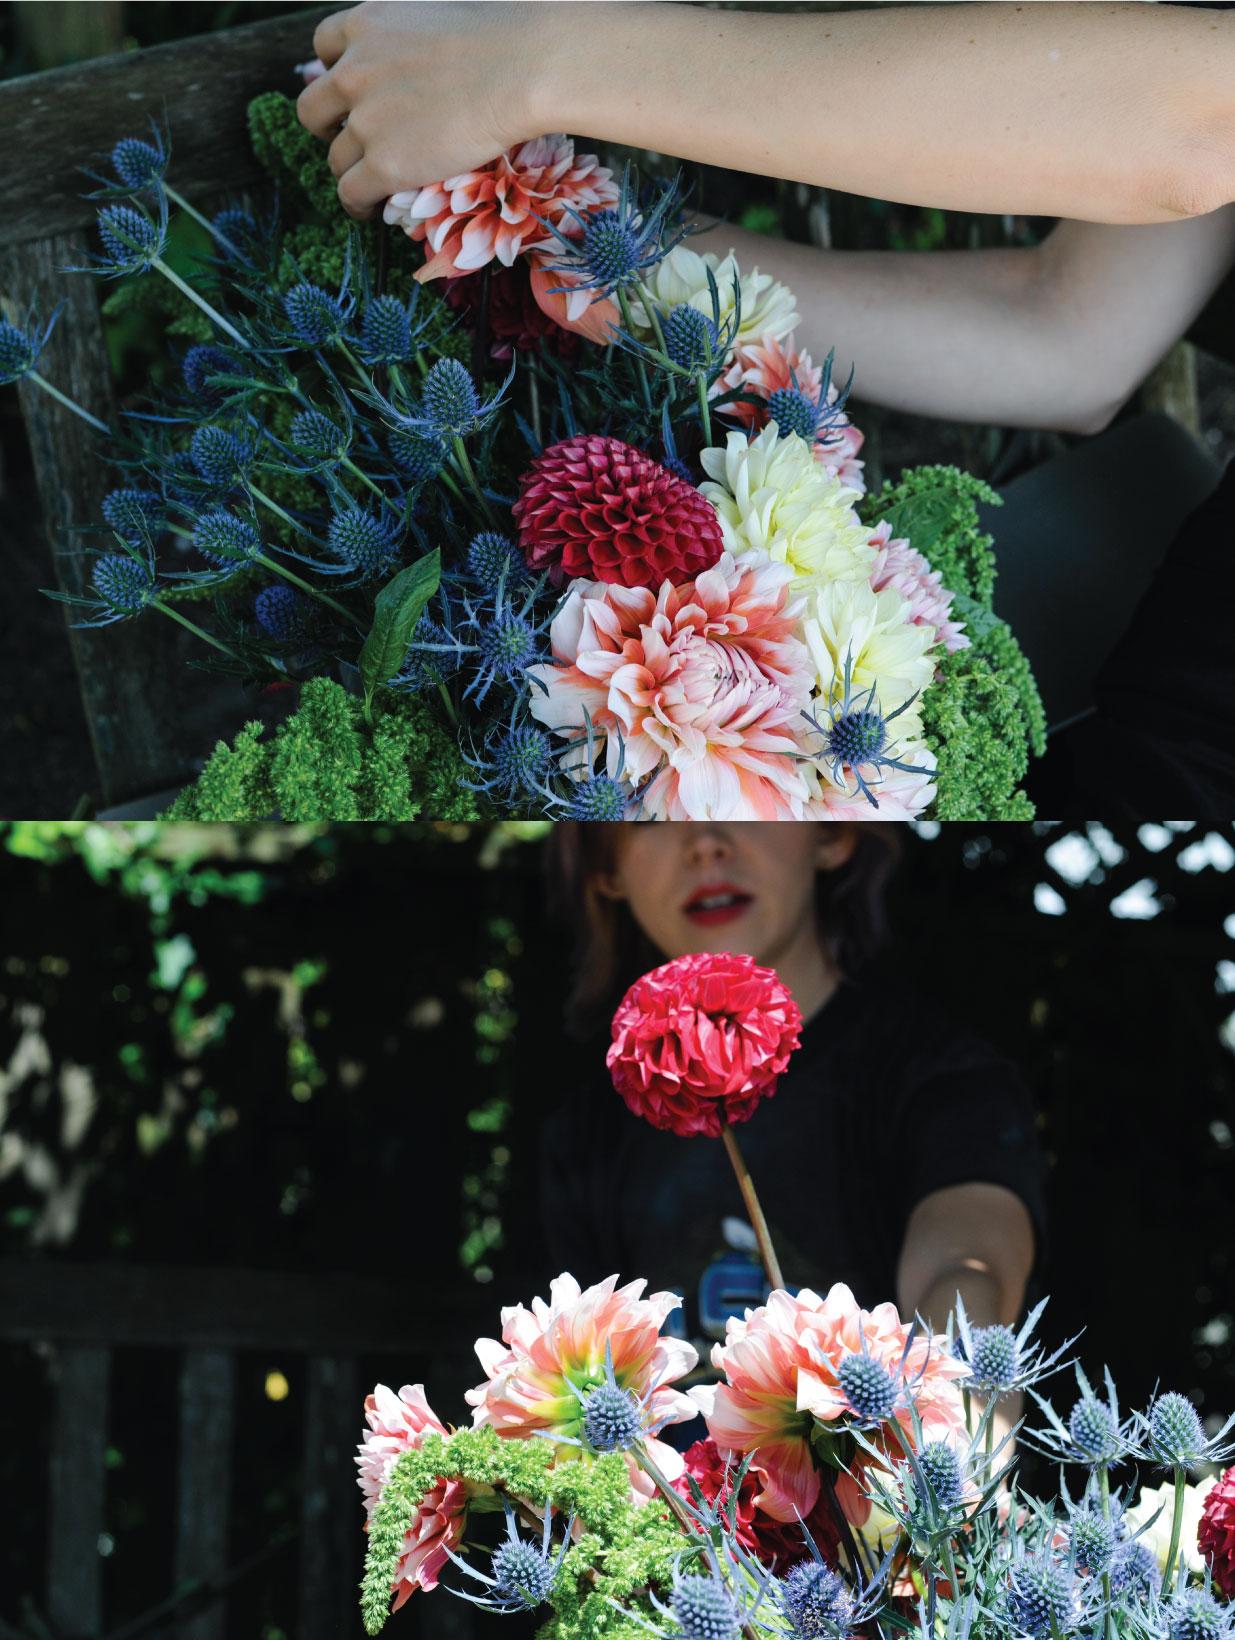 flora pop, san francisco, elope, pop up wedding, bouquet, beautiful bouquet, flowers,